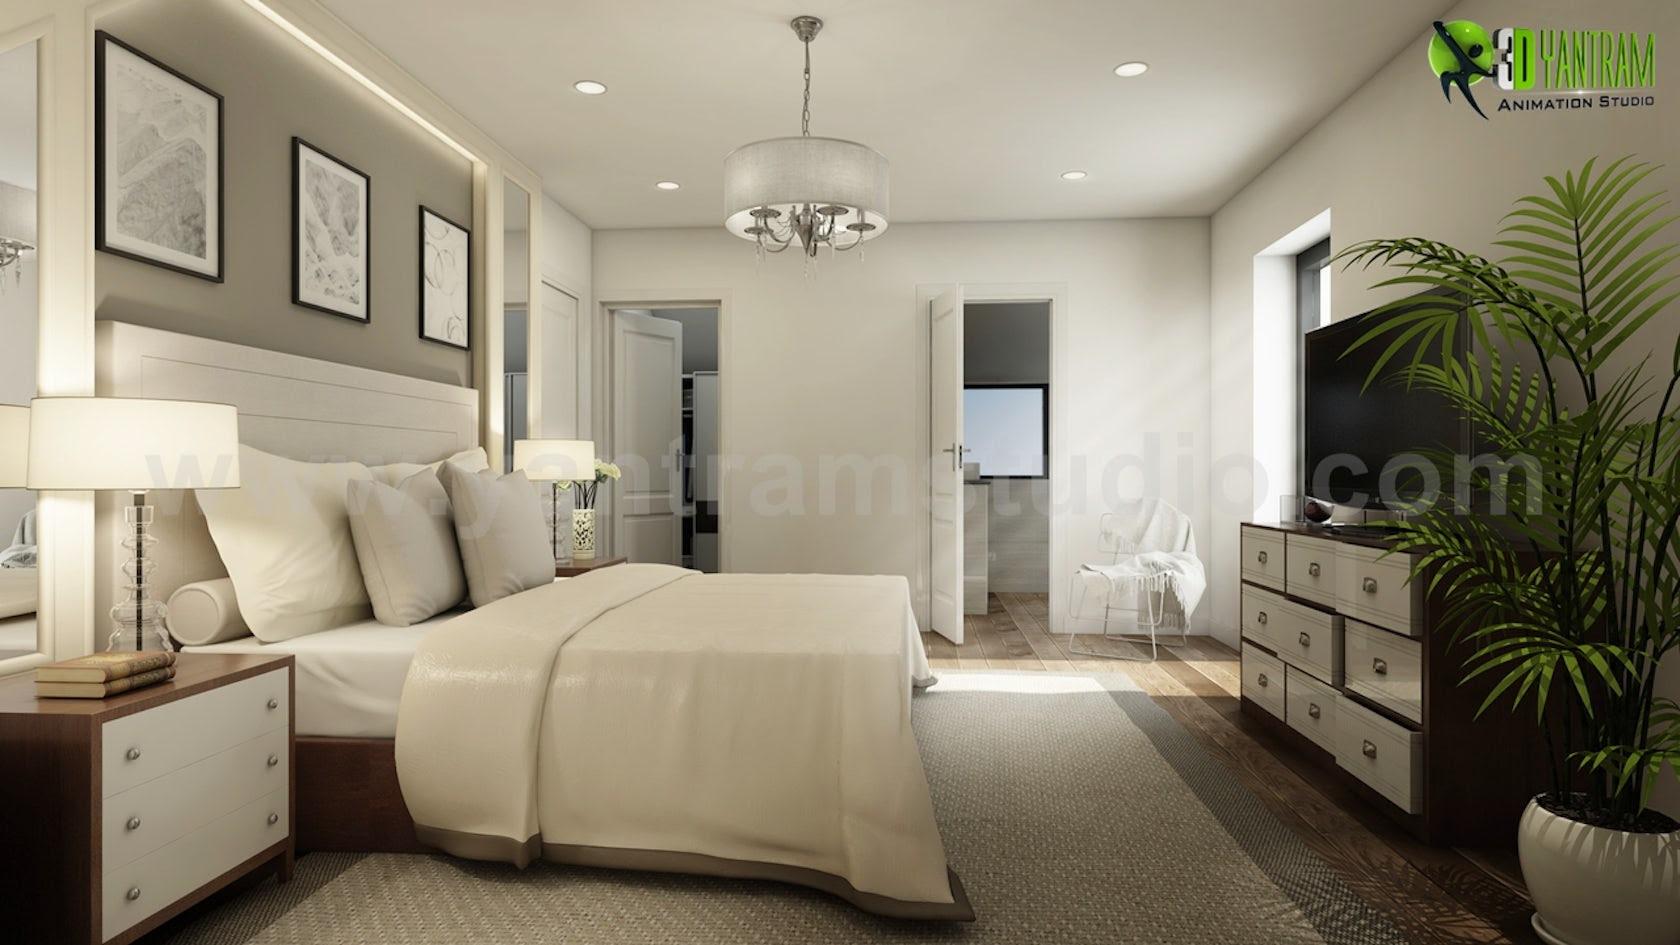 Modern Master Bedroom Ideas Developed By Yantram interior ...